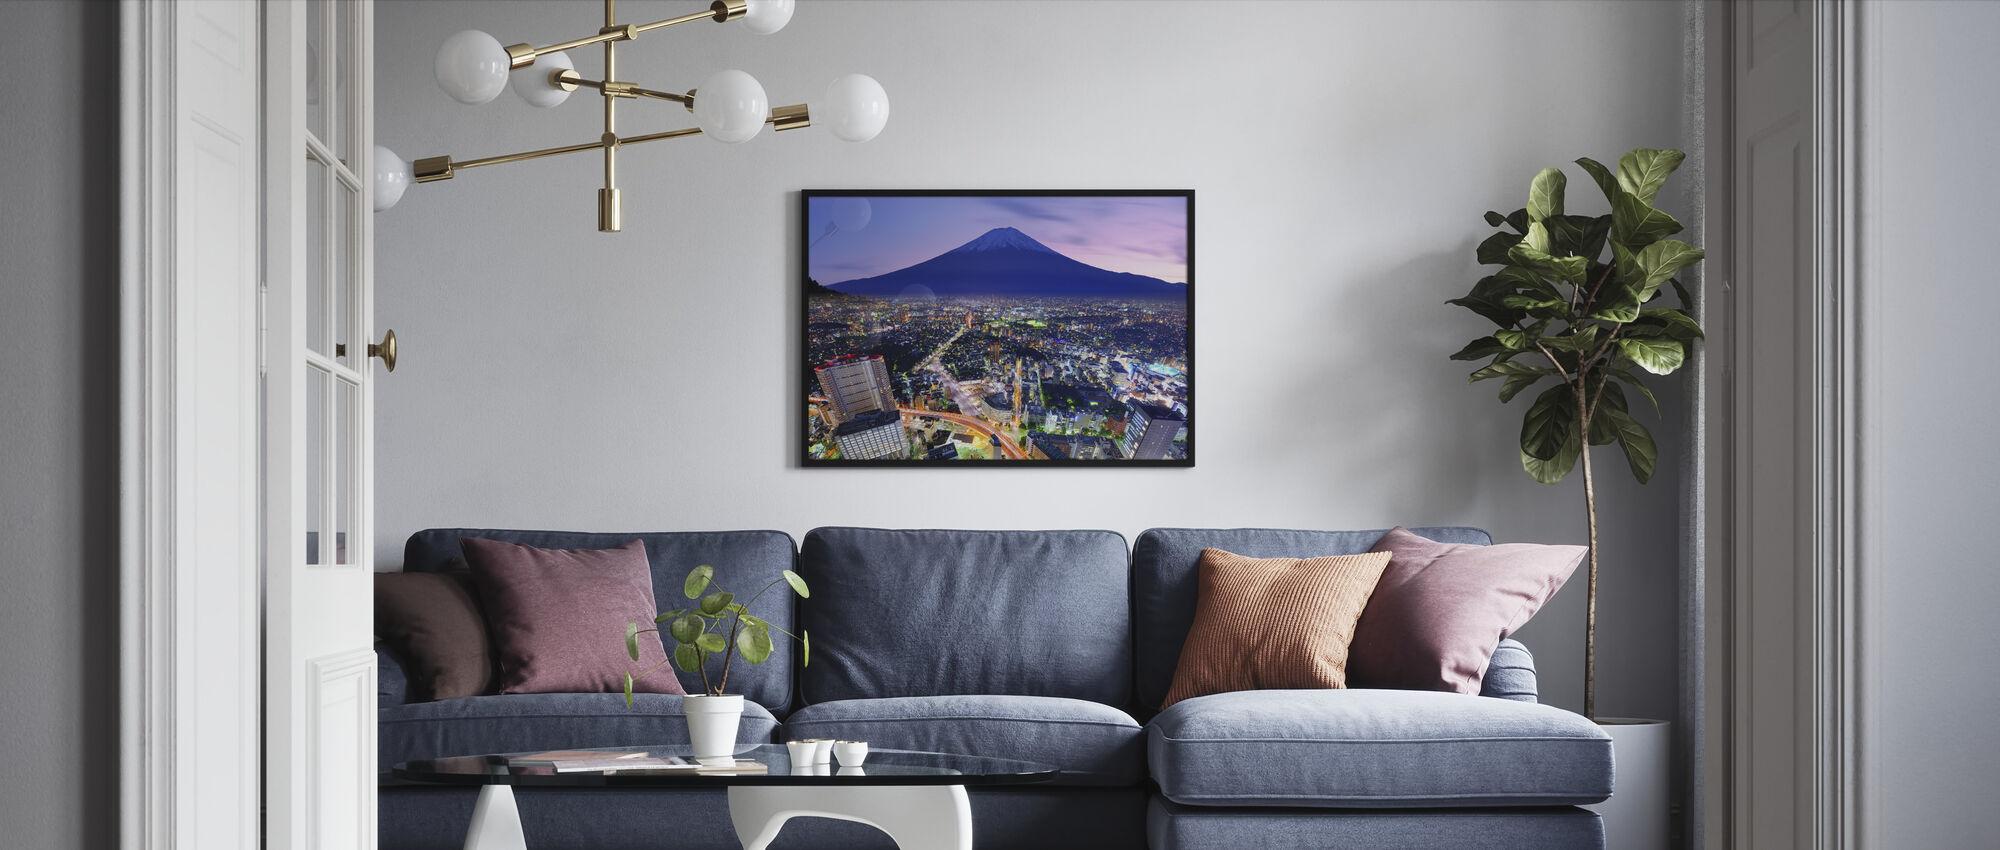 Ueno District and Mt. Fuji in Tokyo, Japan - Framed print - Living Room